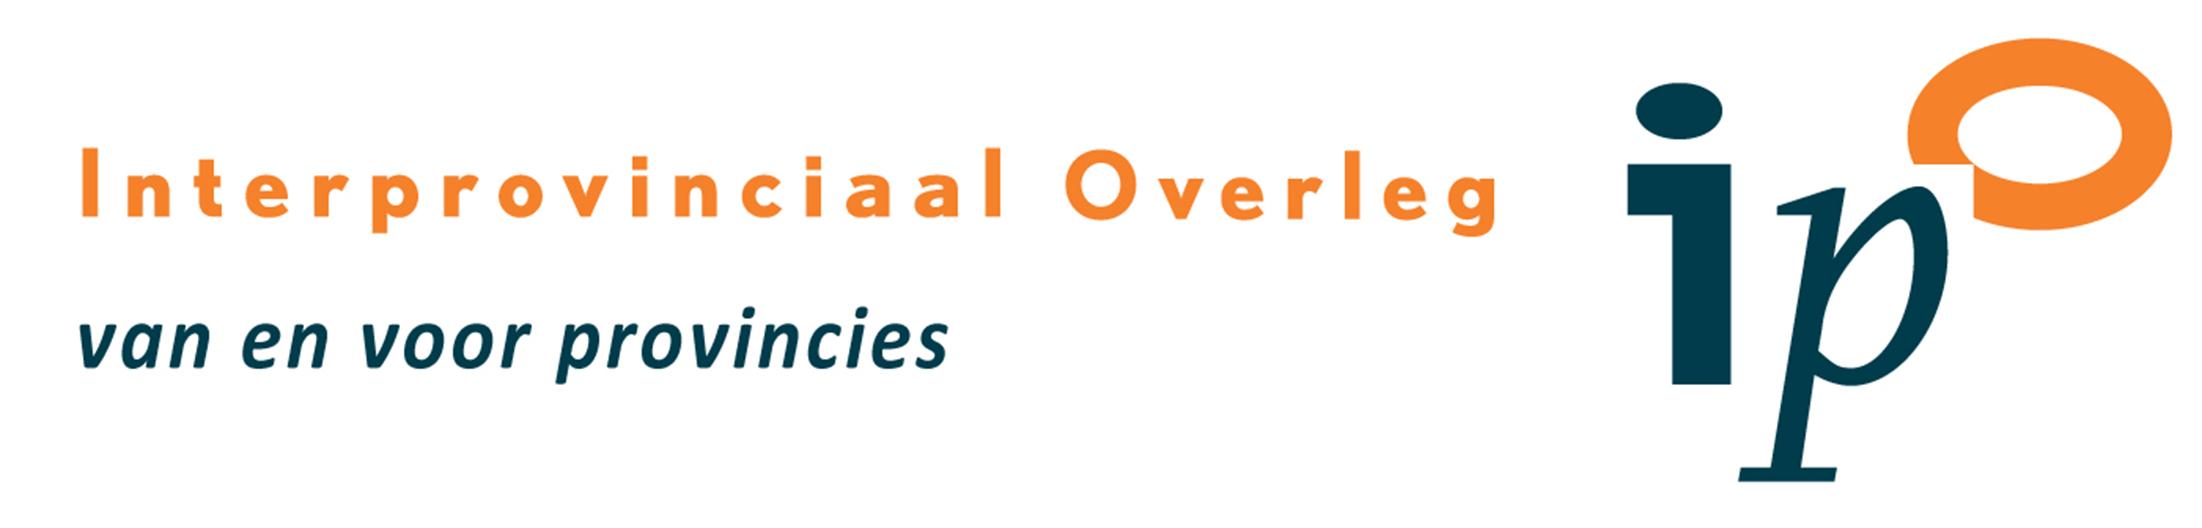 interprovinciaal_overleg